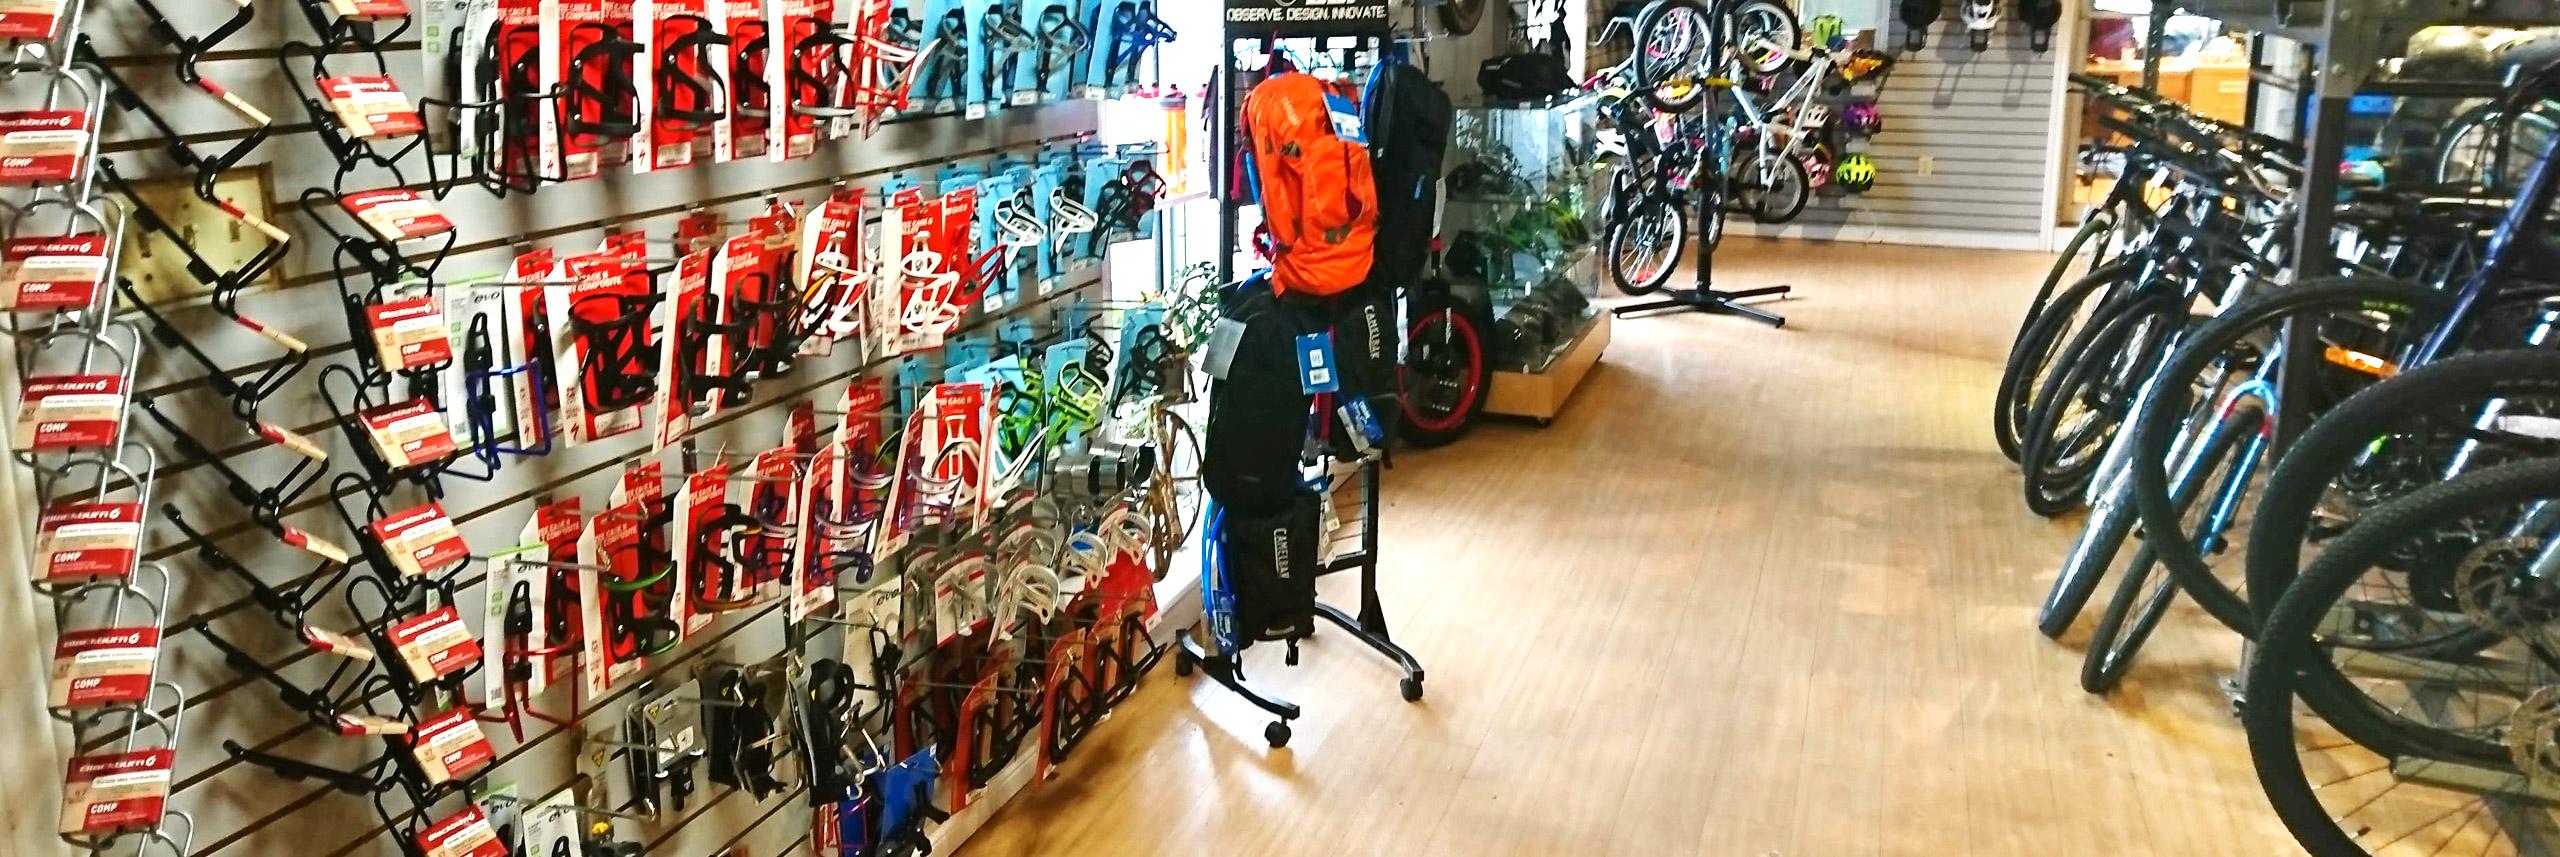 Bike Shop – Sales   Repairs – MacQueen s Bike Shop   Island Tours b54596d23